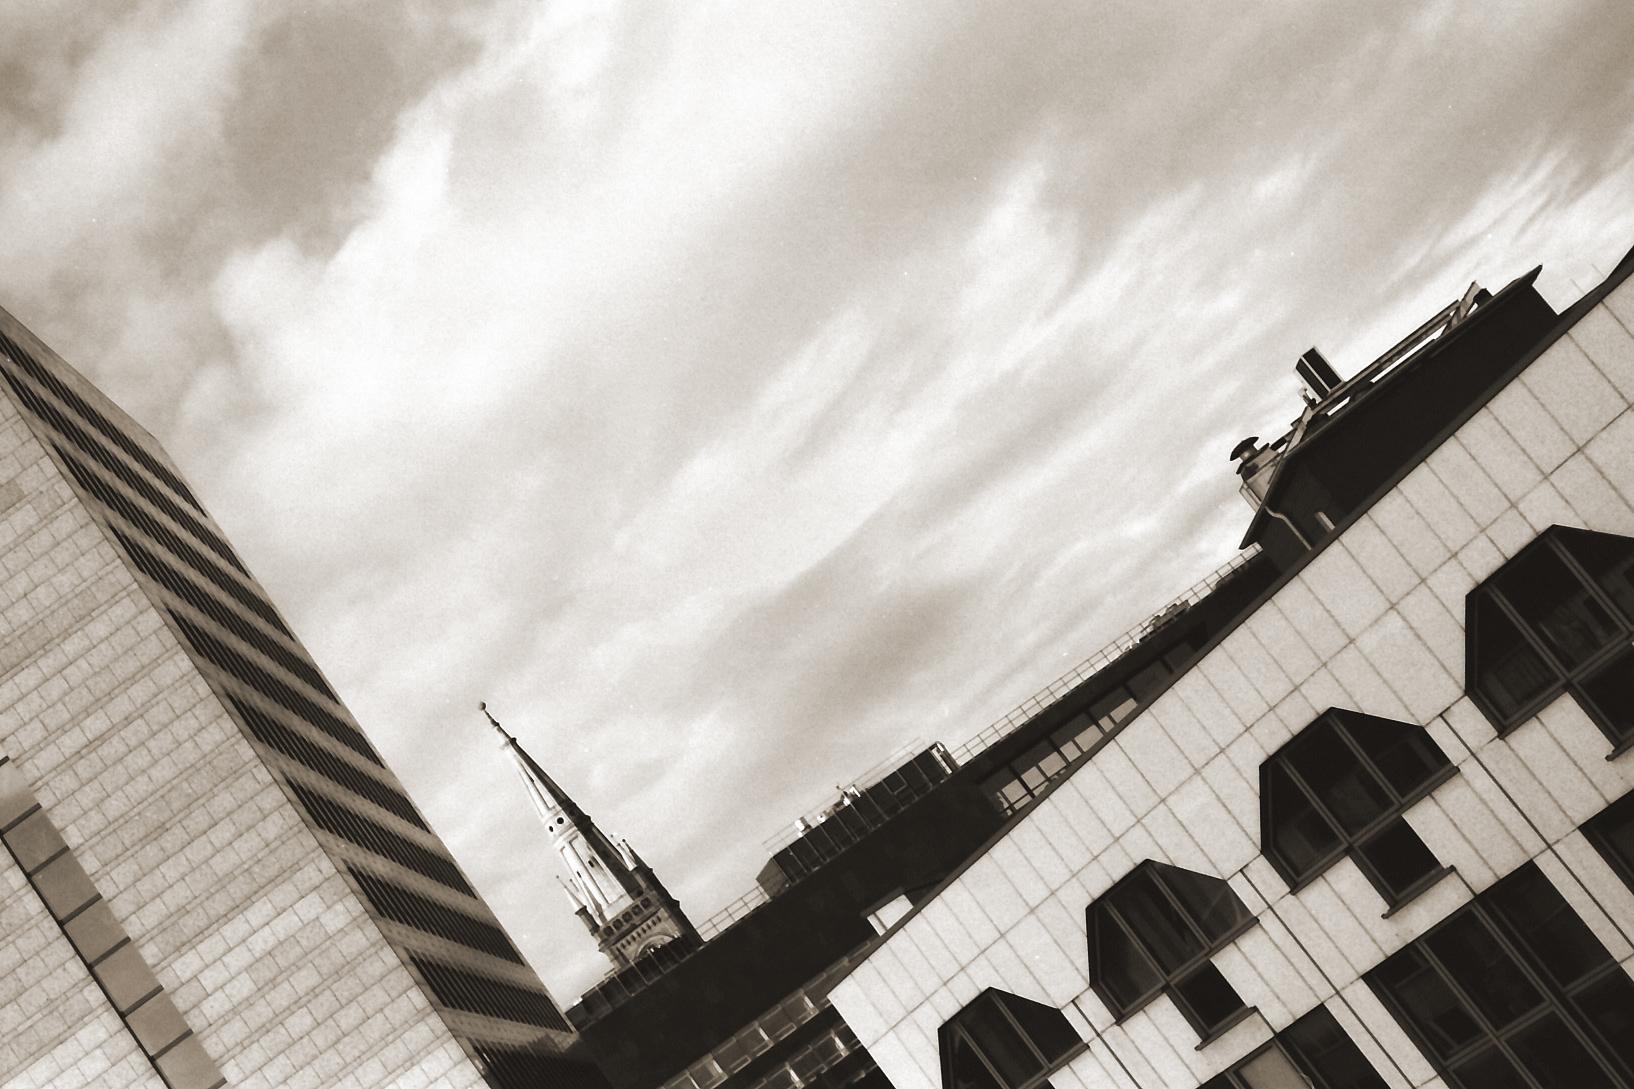 Blick über Häuserdächer